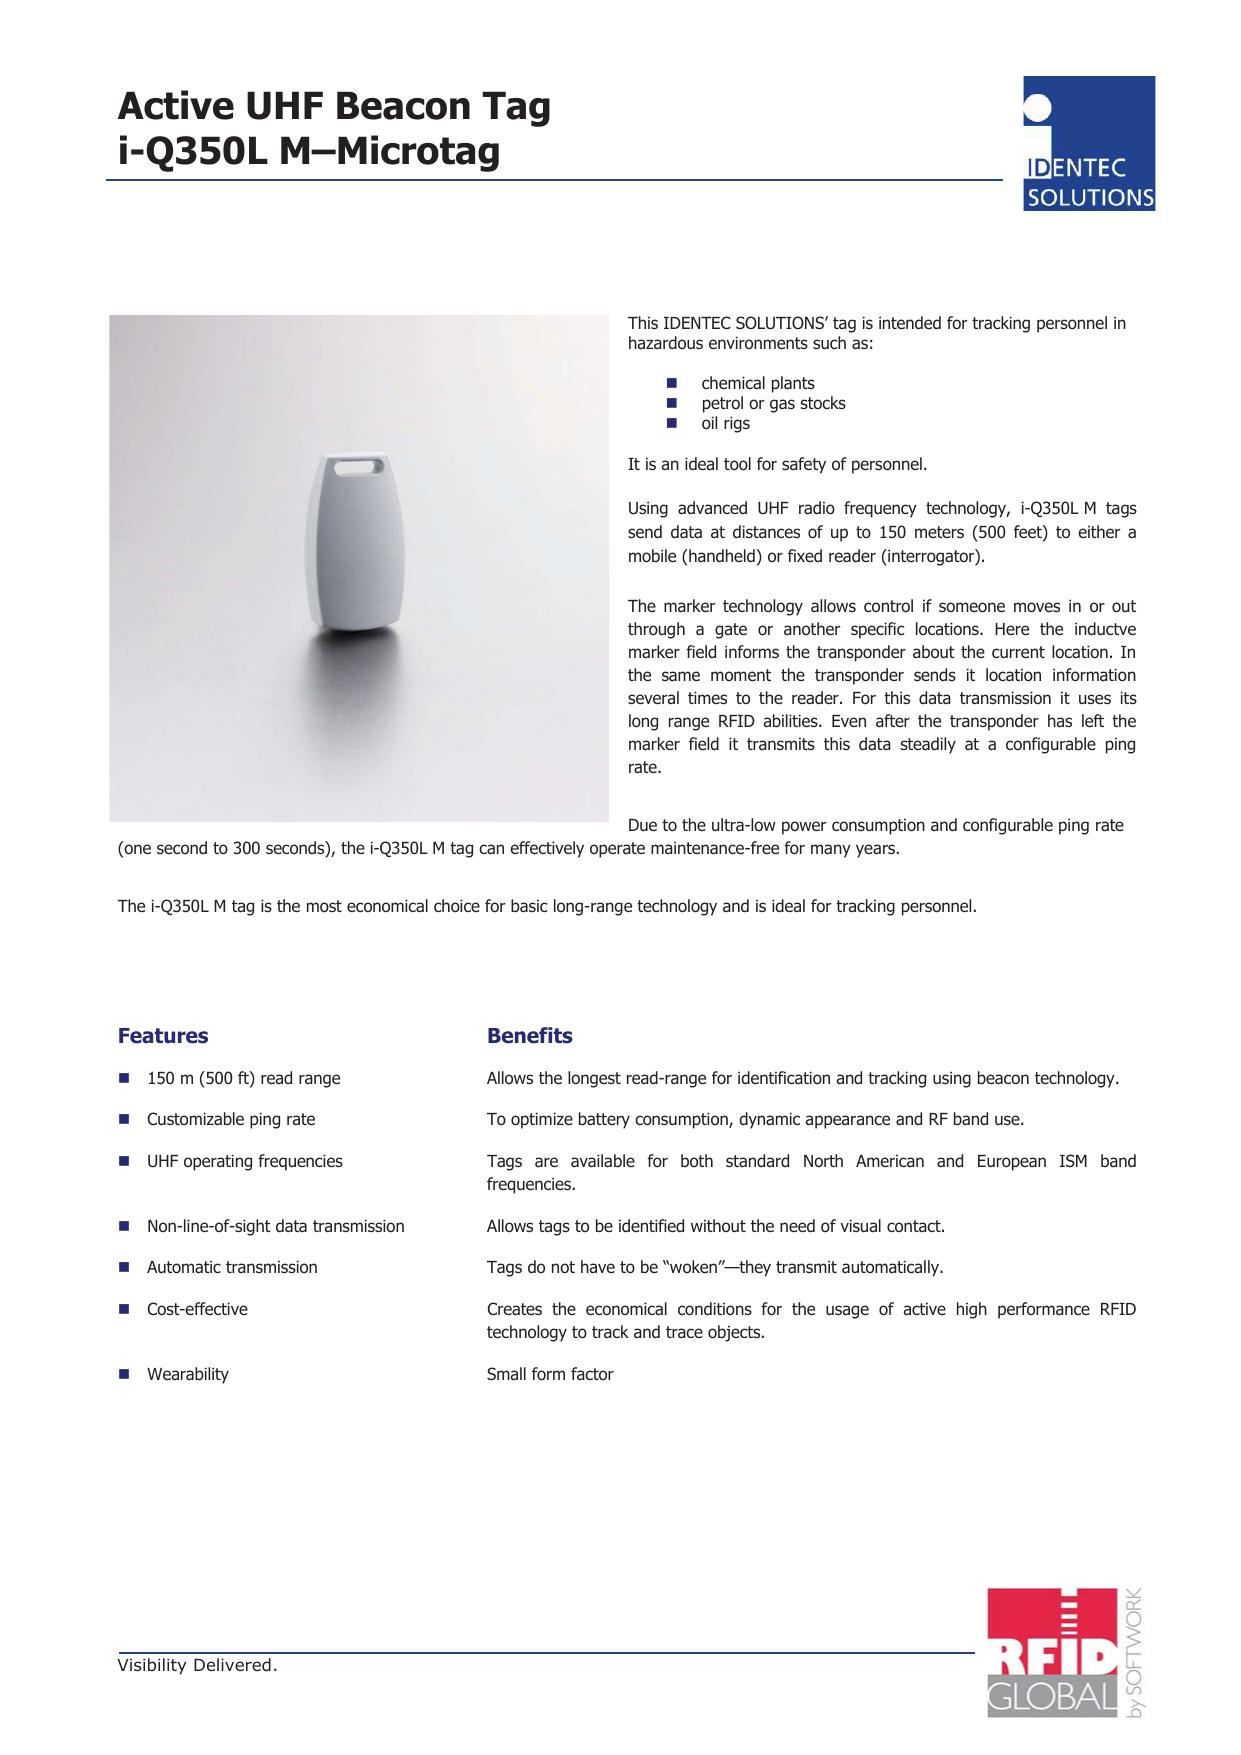 Active UHF Beacon Tag i-Q350L M–Microtag | manualzz com